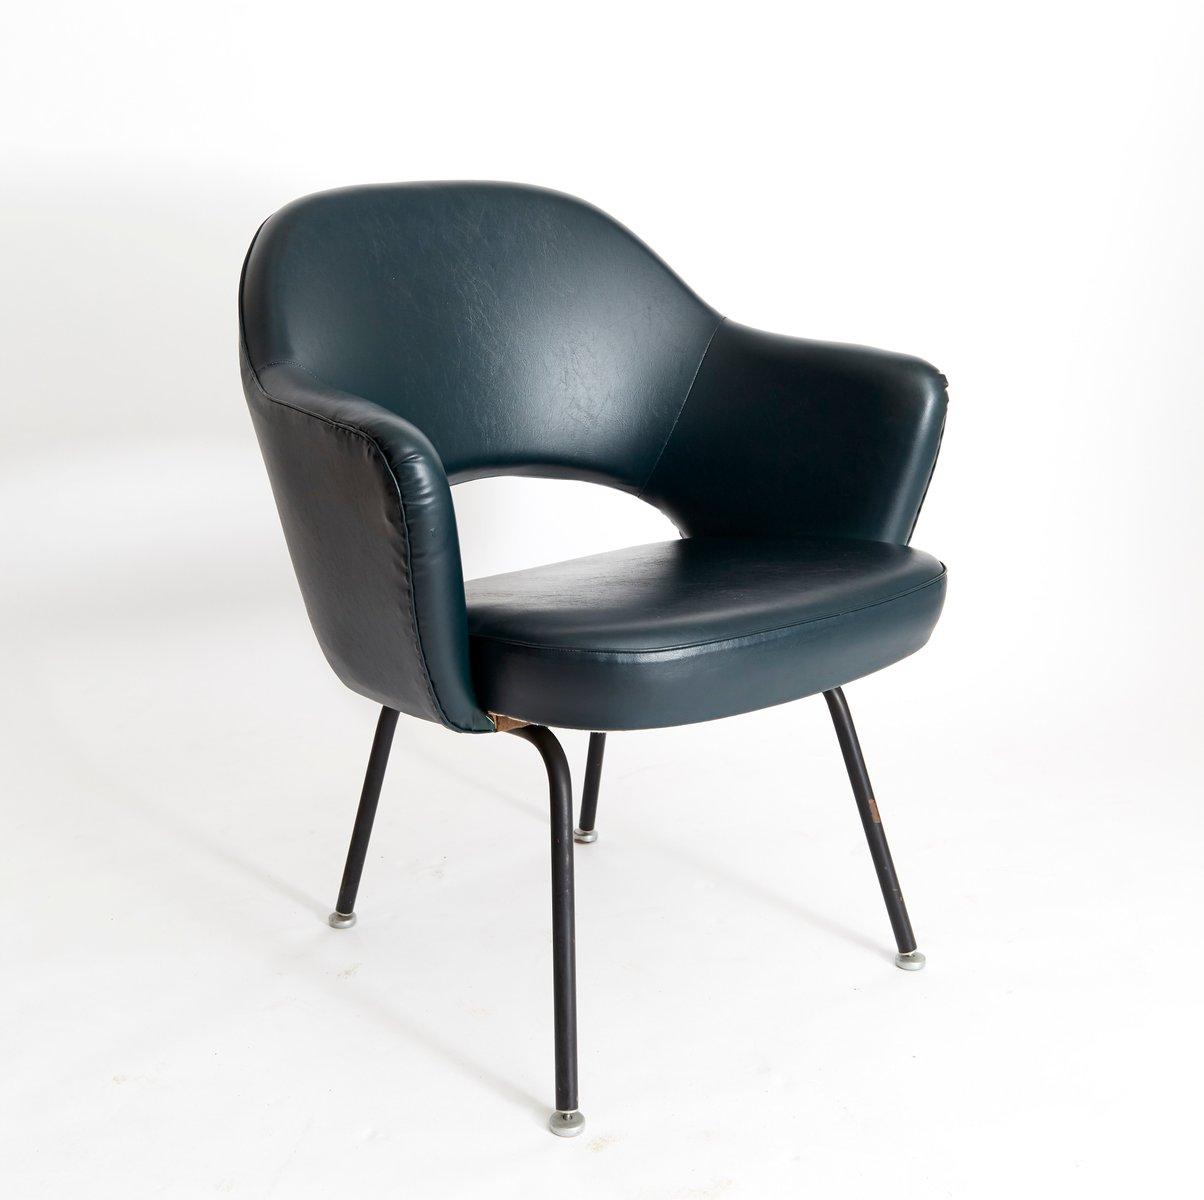 knoll saarinen chair smartseat protector executive by eero for international